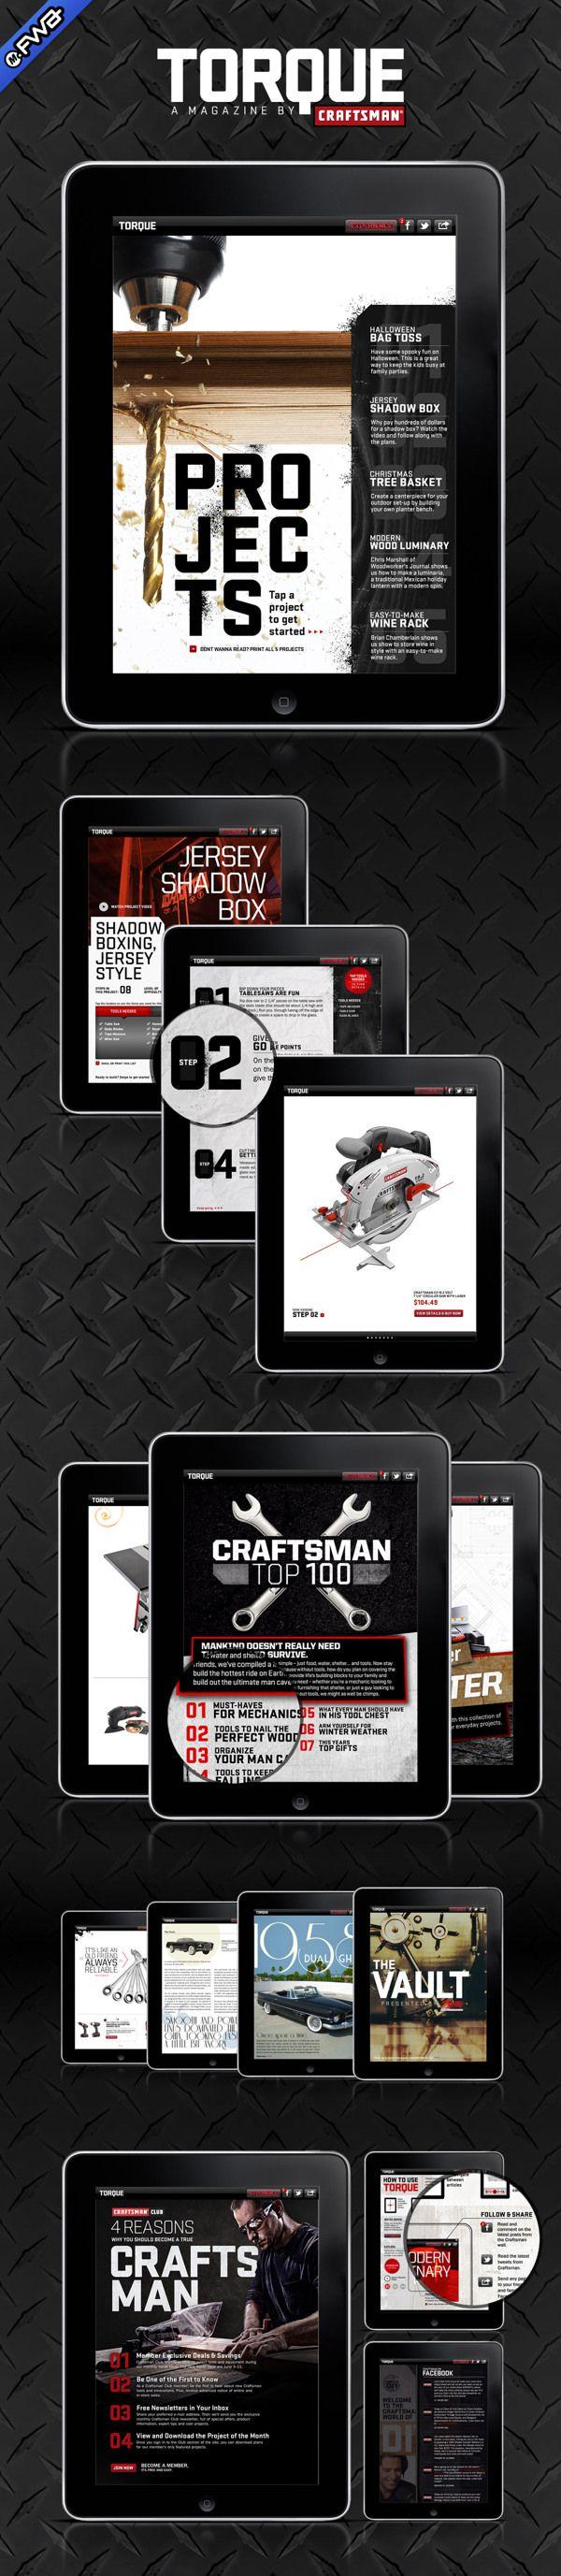 Craftsman Torque iPad Magazine by Michael Janiak, via Behance